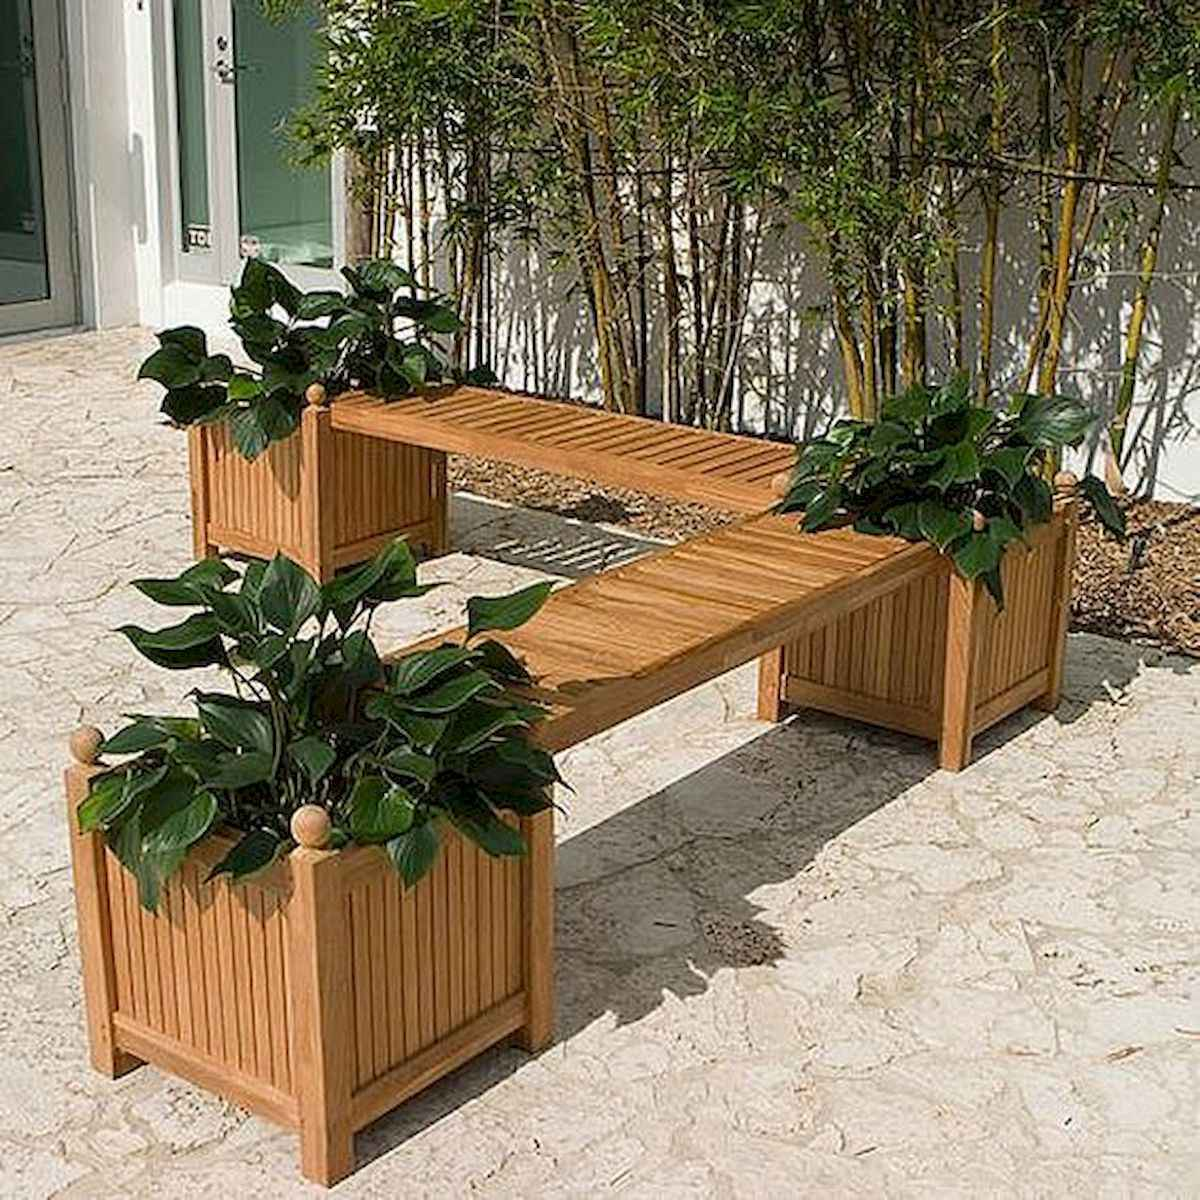 60 Amazing DIY Projects Otdoors Furniture Design Ideas (51)